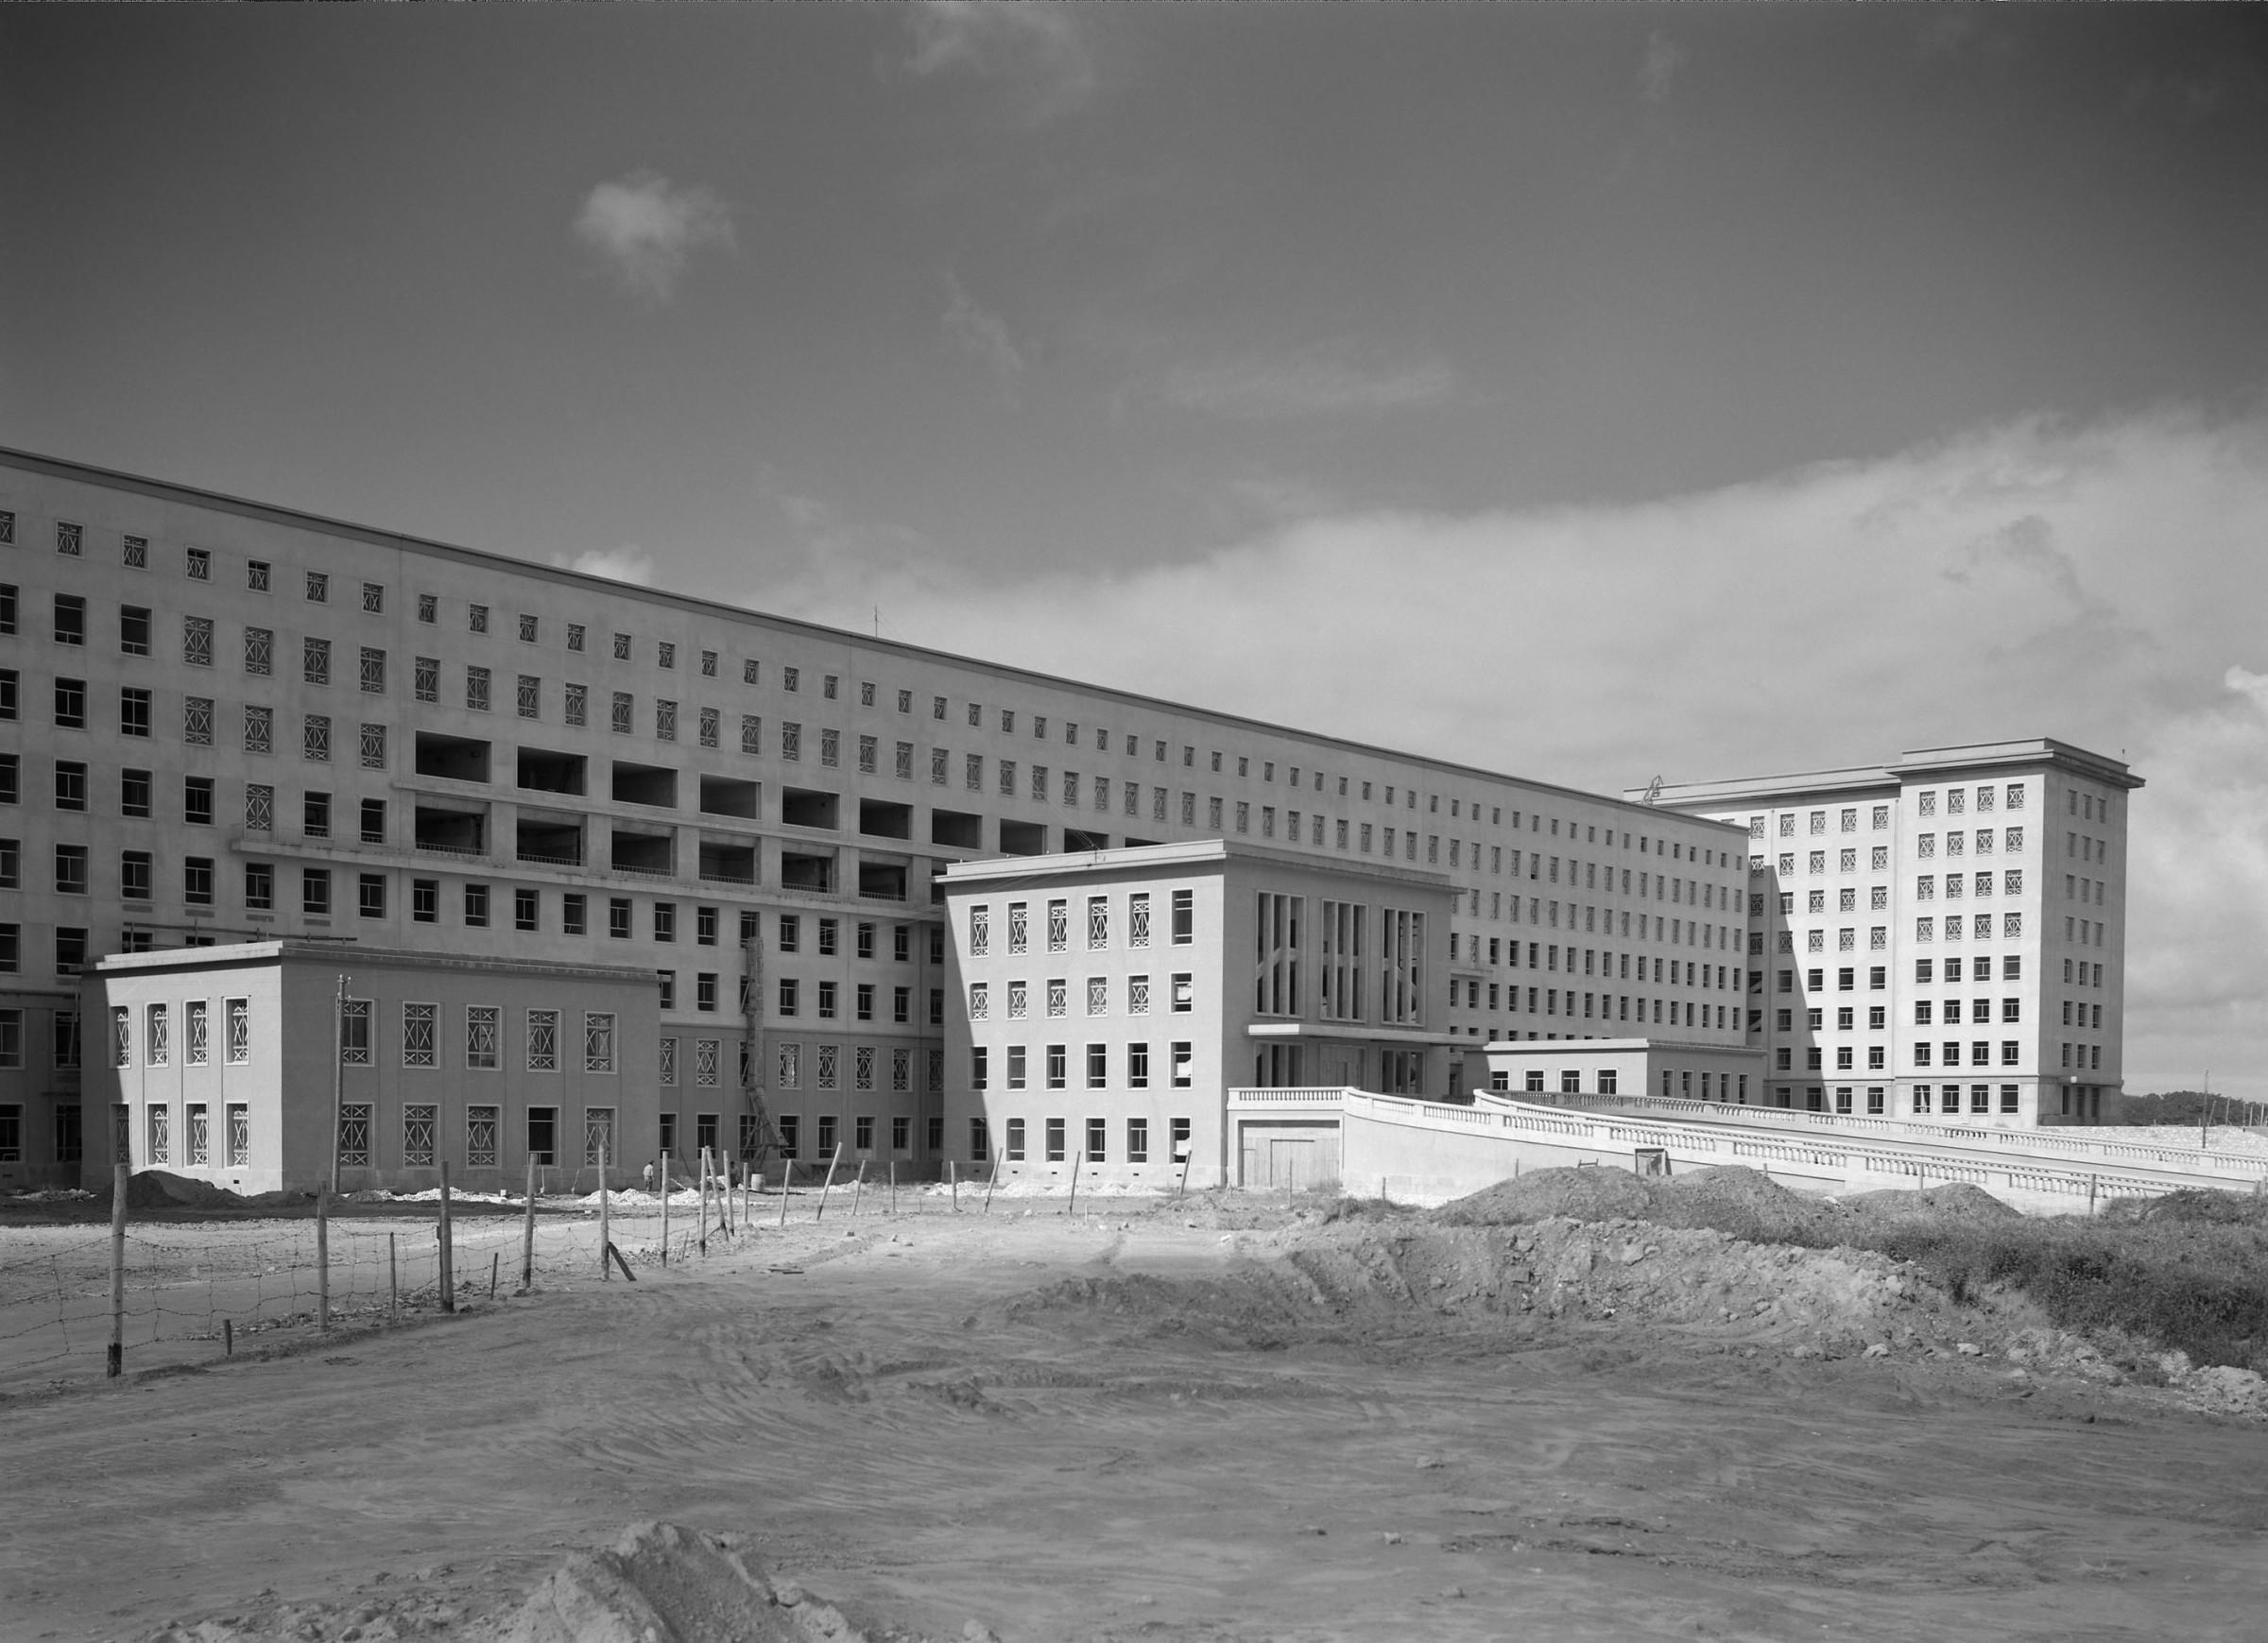 07-construc3a7c3a3o-hsm-1950.jpg